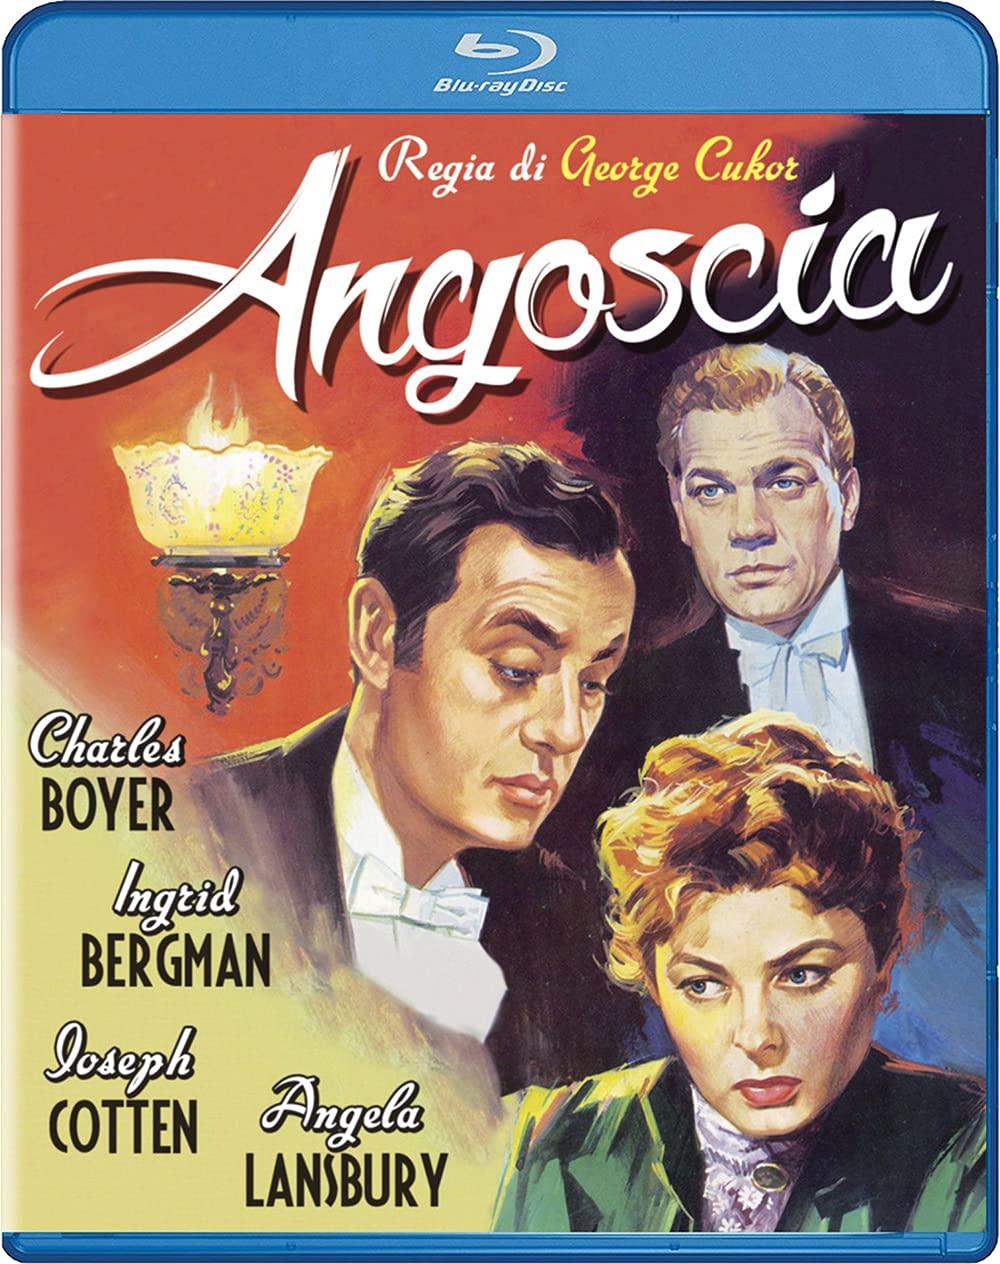 ANGOSCIA - 1944 (BLU-RAY)